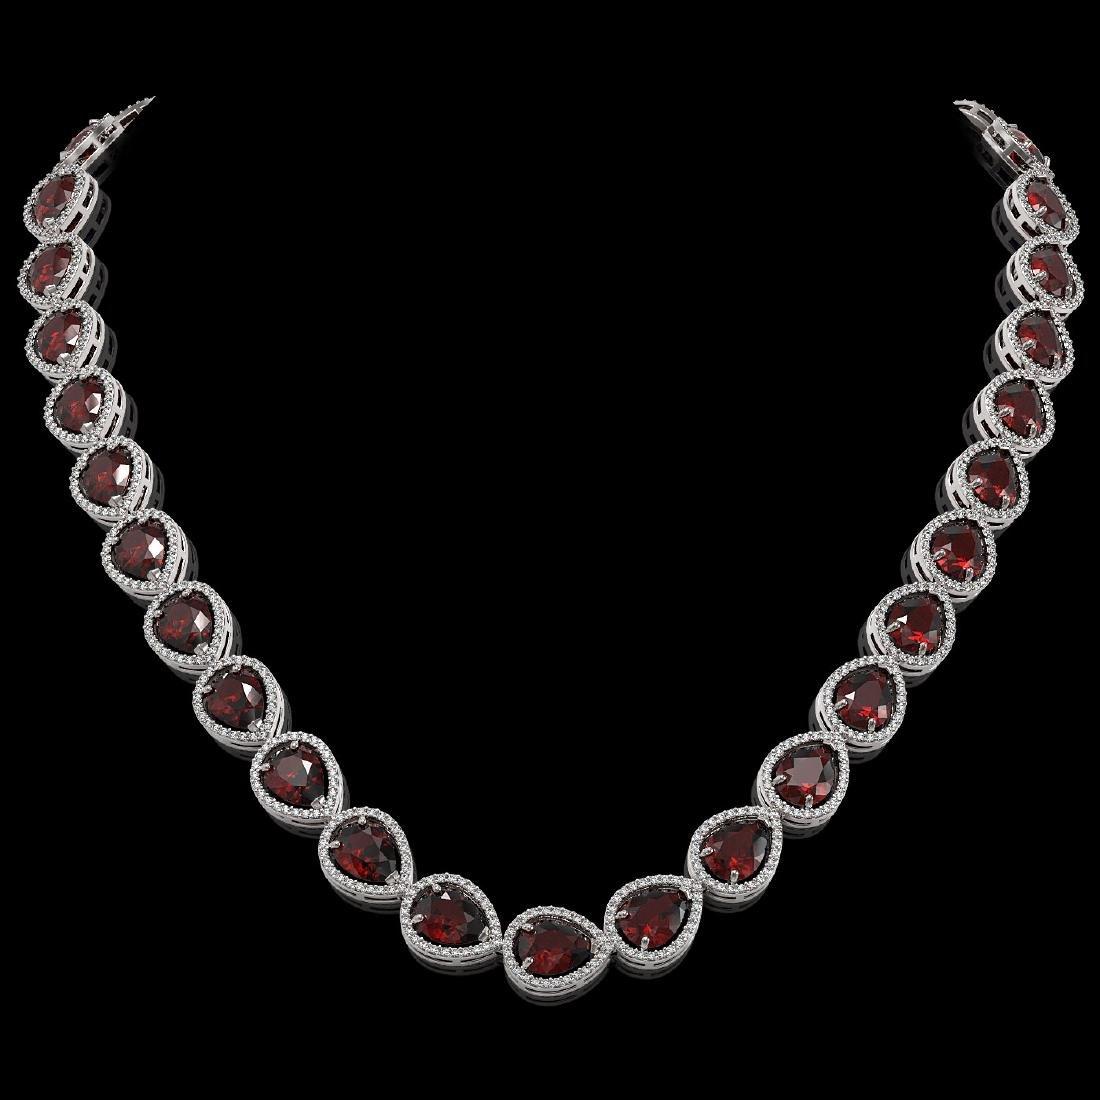 36.8 CTW Garnet & Diamond Halo Necklace 10K White Gold